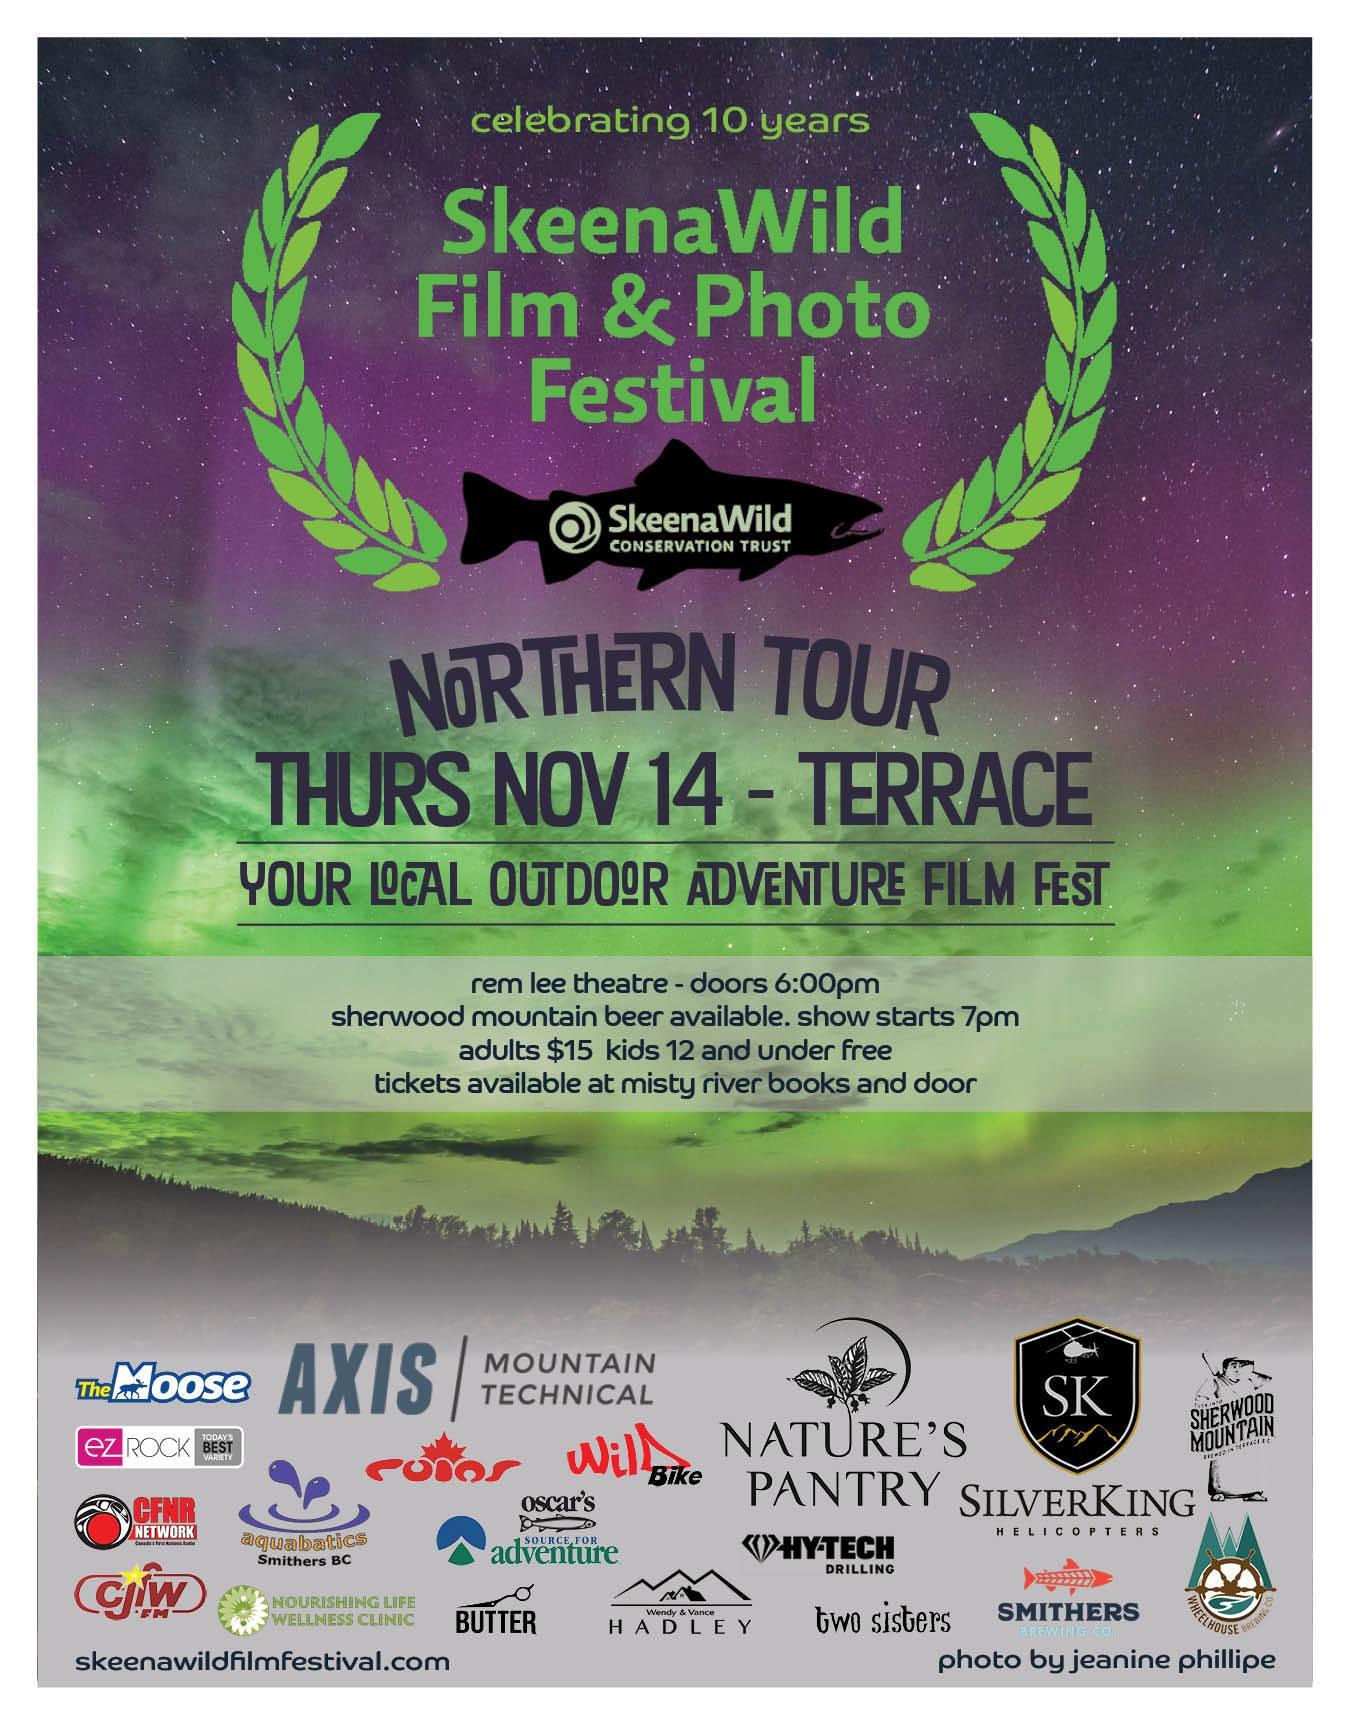 SkeenaWild Film & Photo Festival NOV 14